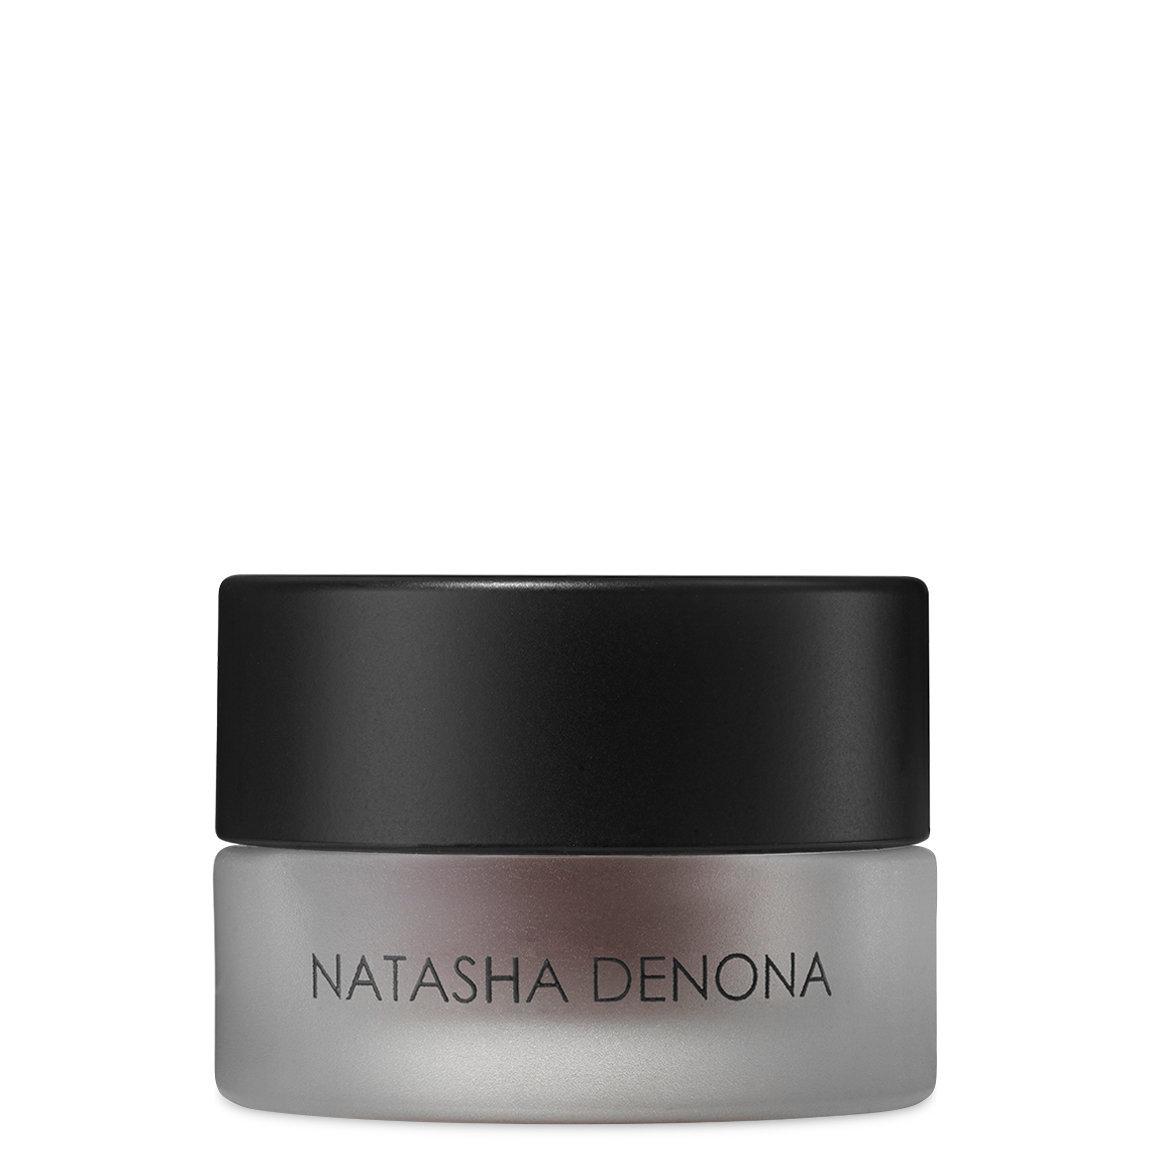 Natasha Denona Work & Set Cream Eyeliner Brown alternative view 1.